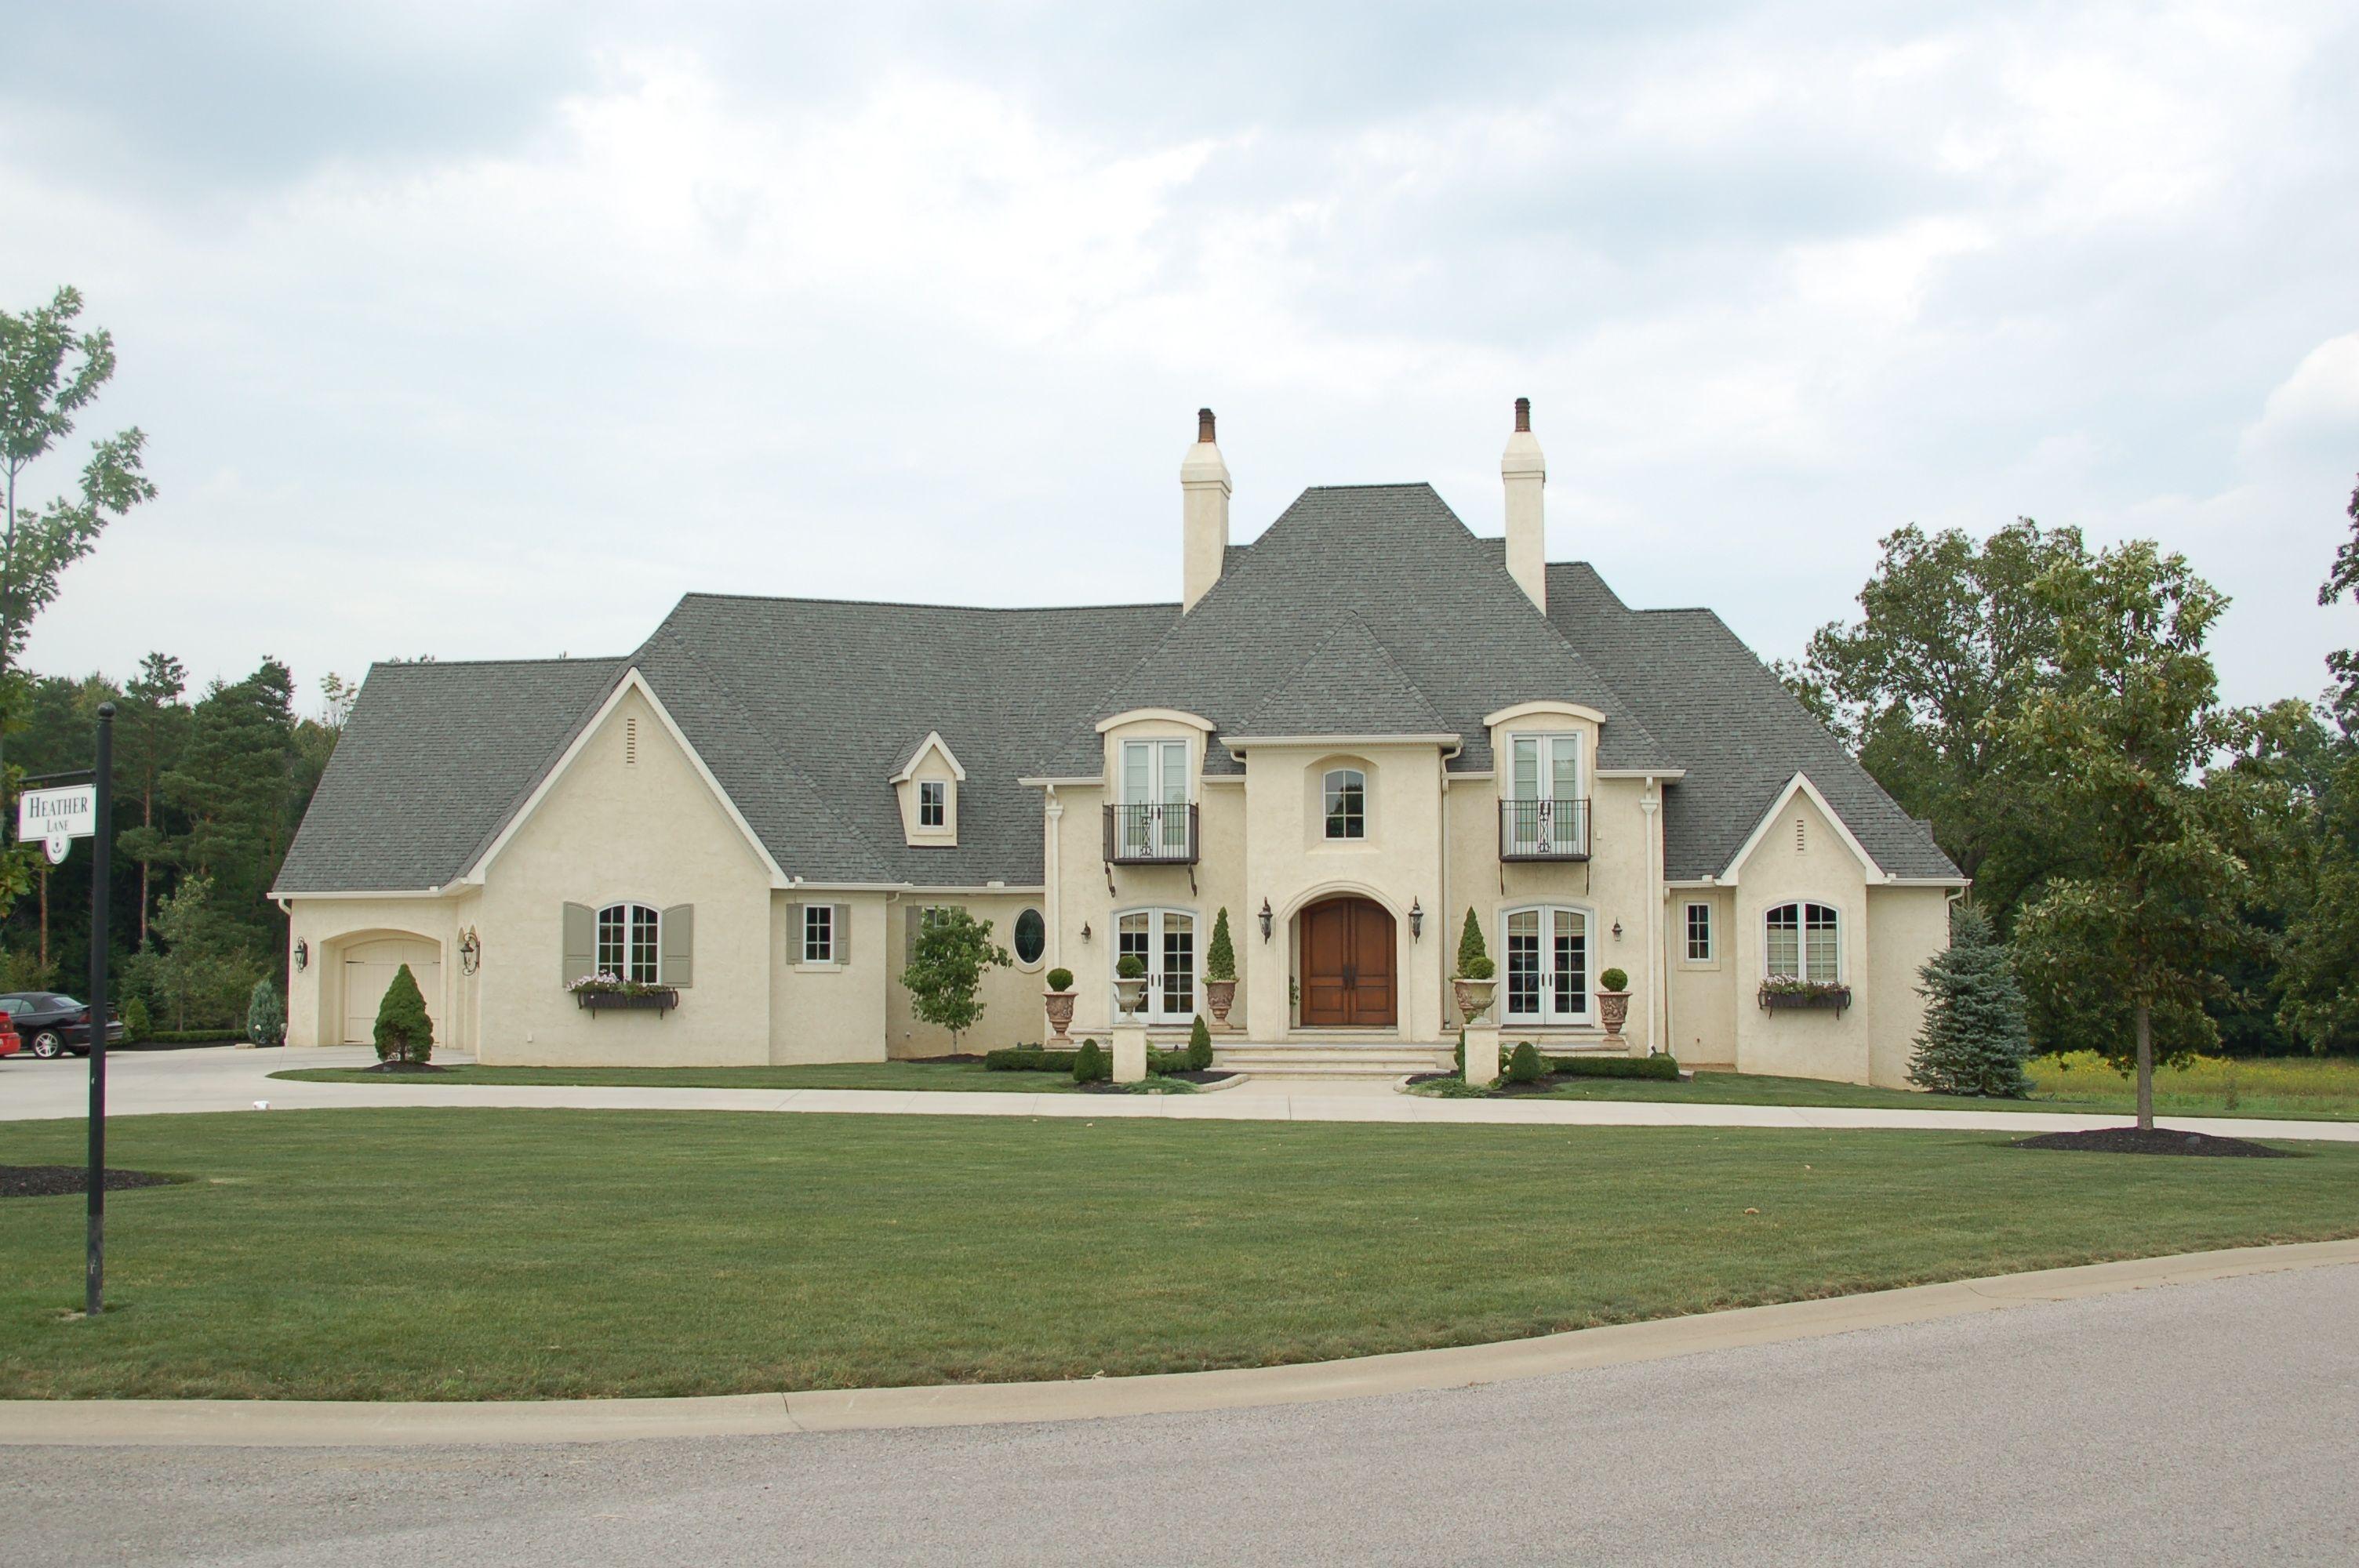 Stone and Stucco Homes Design